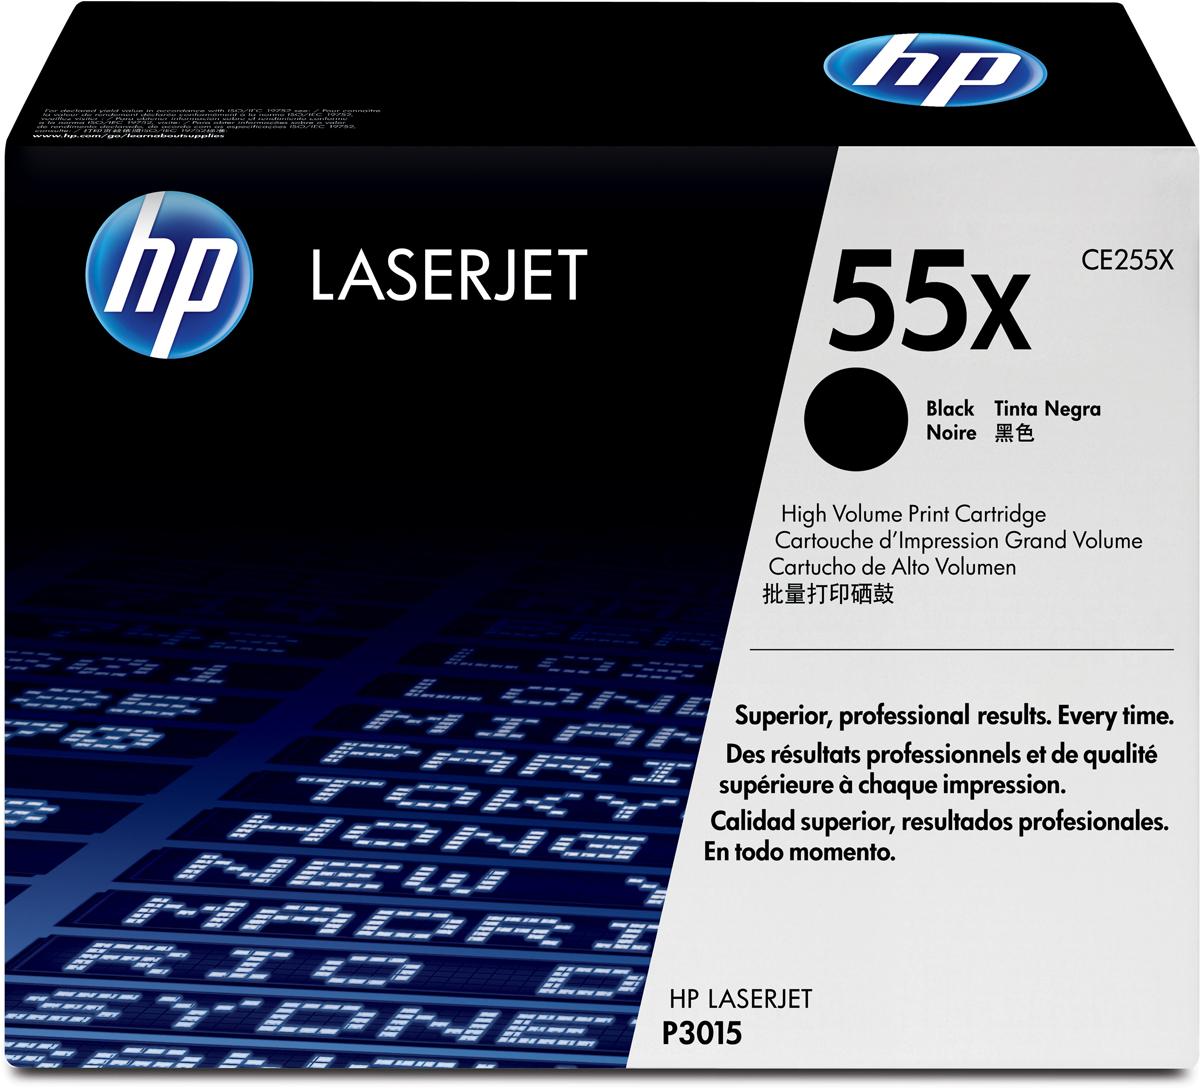 HP CE255X, Black тонер-картридж для LaserJet Enterprise P3015/P3015d/P3015dn/P3015xCE255X